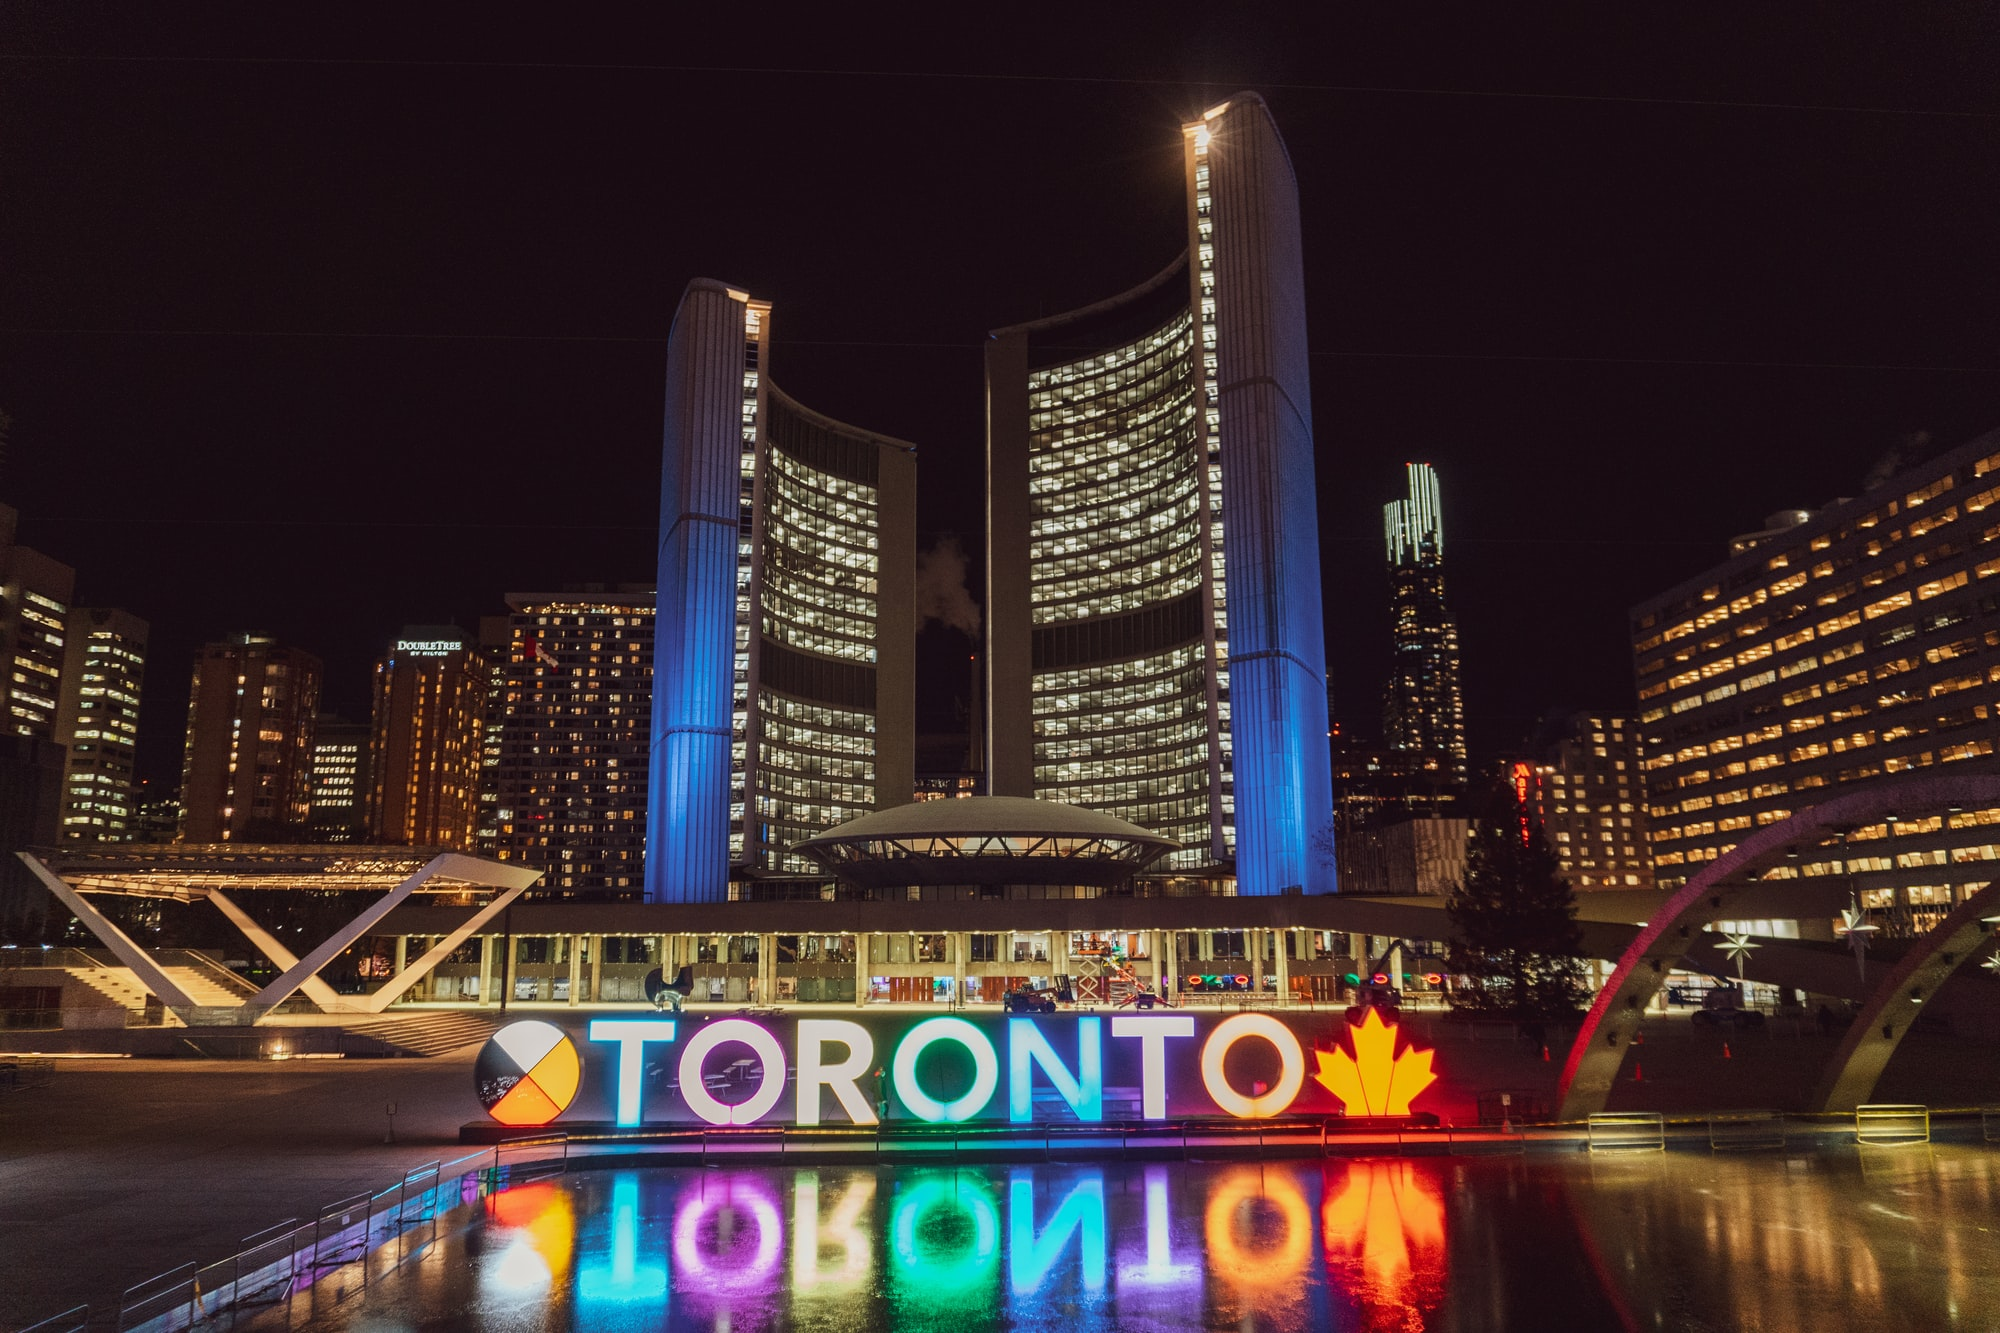 The Toronto Lights